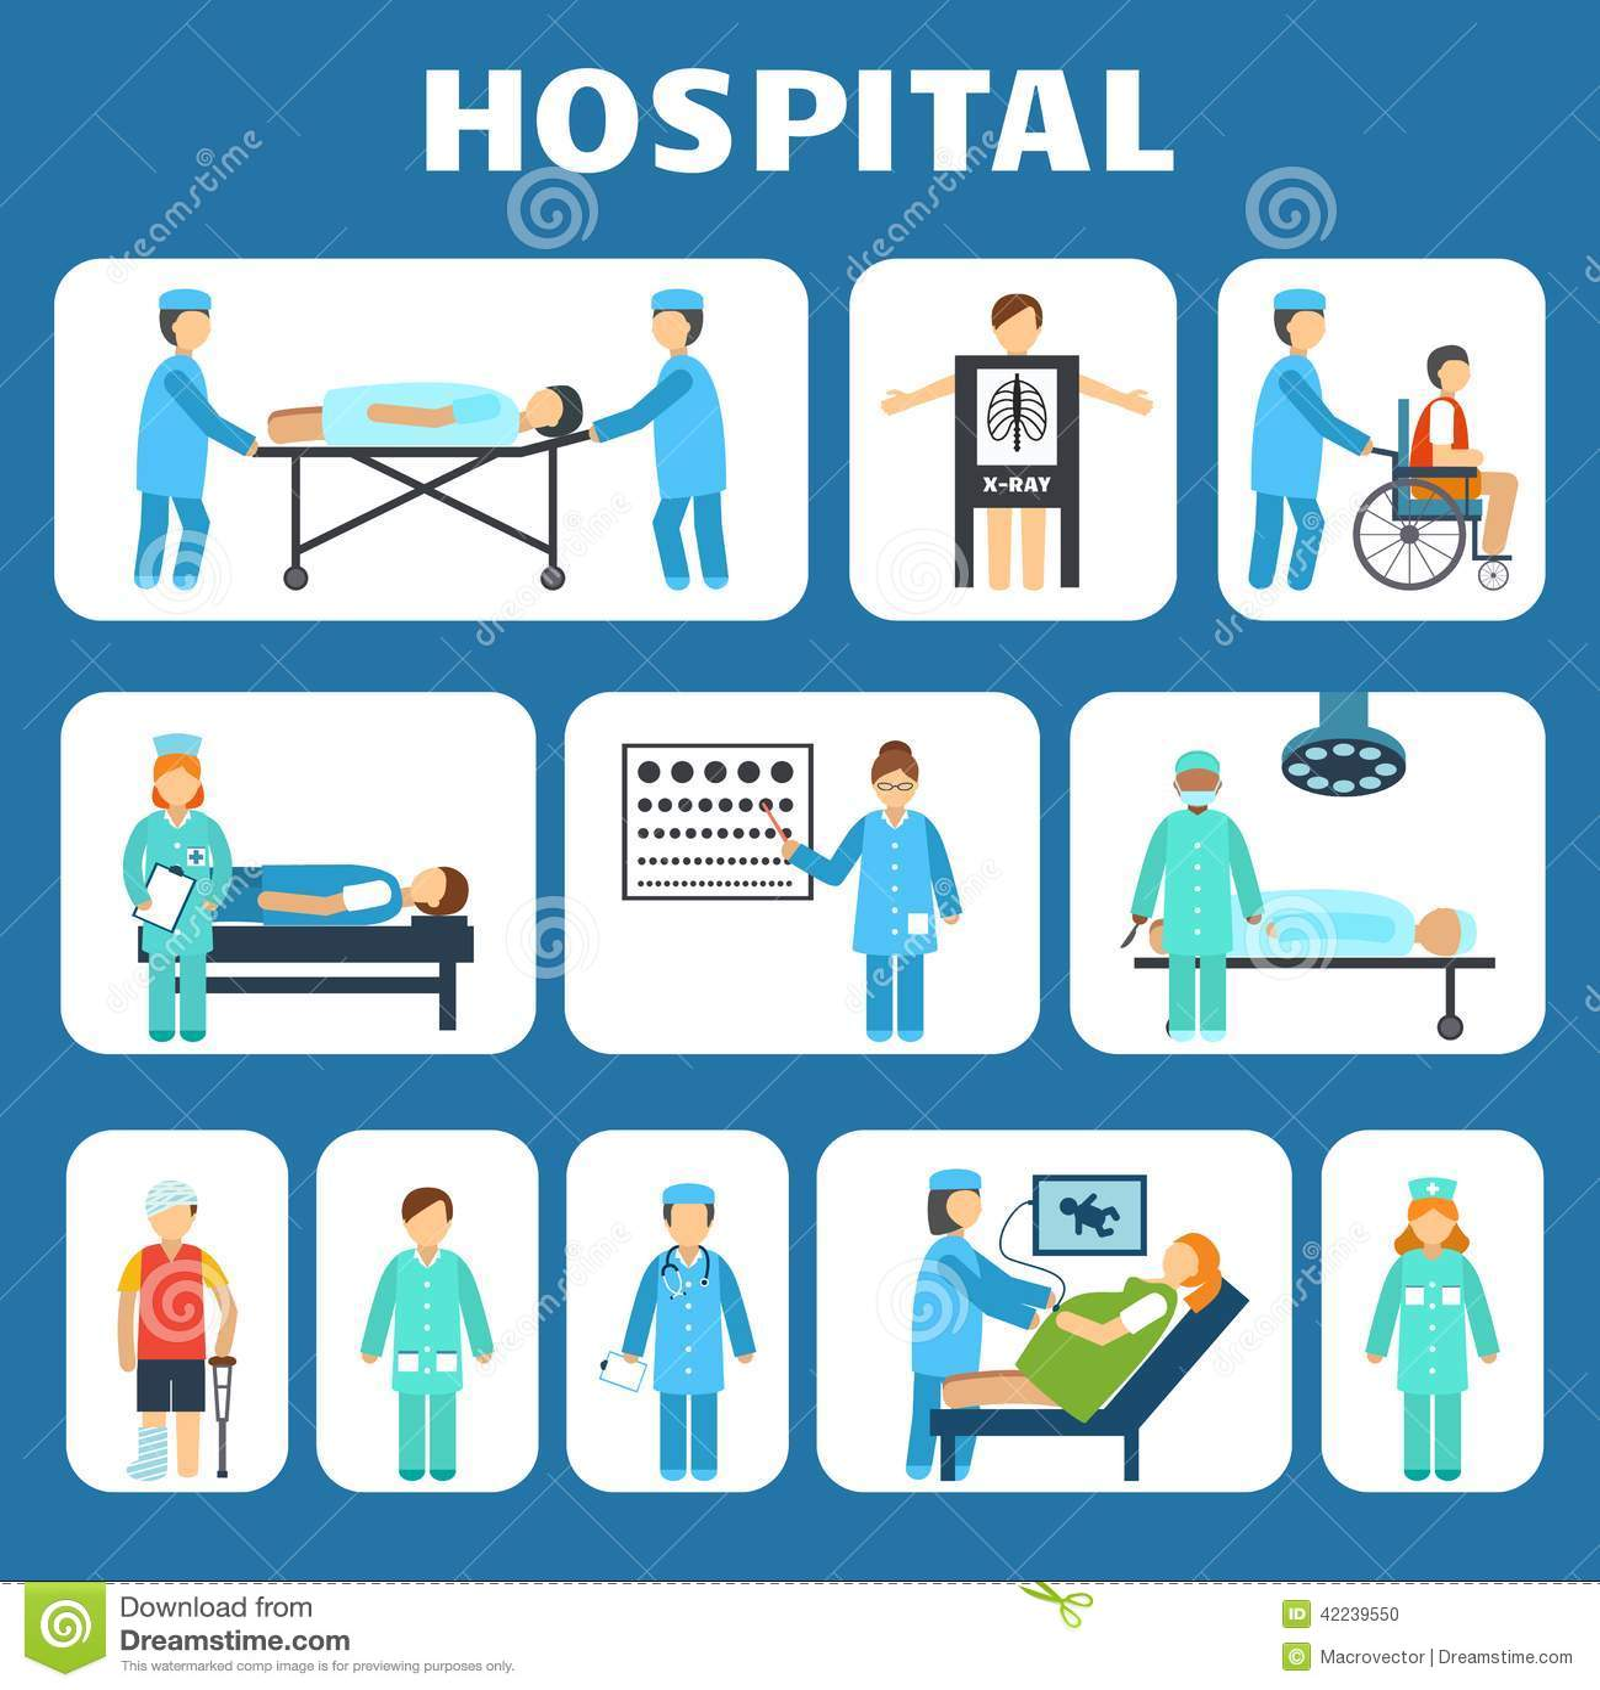 Medical Flat Pictograms Set Stock Vector - Image: 42239550